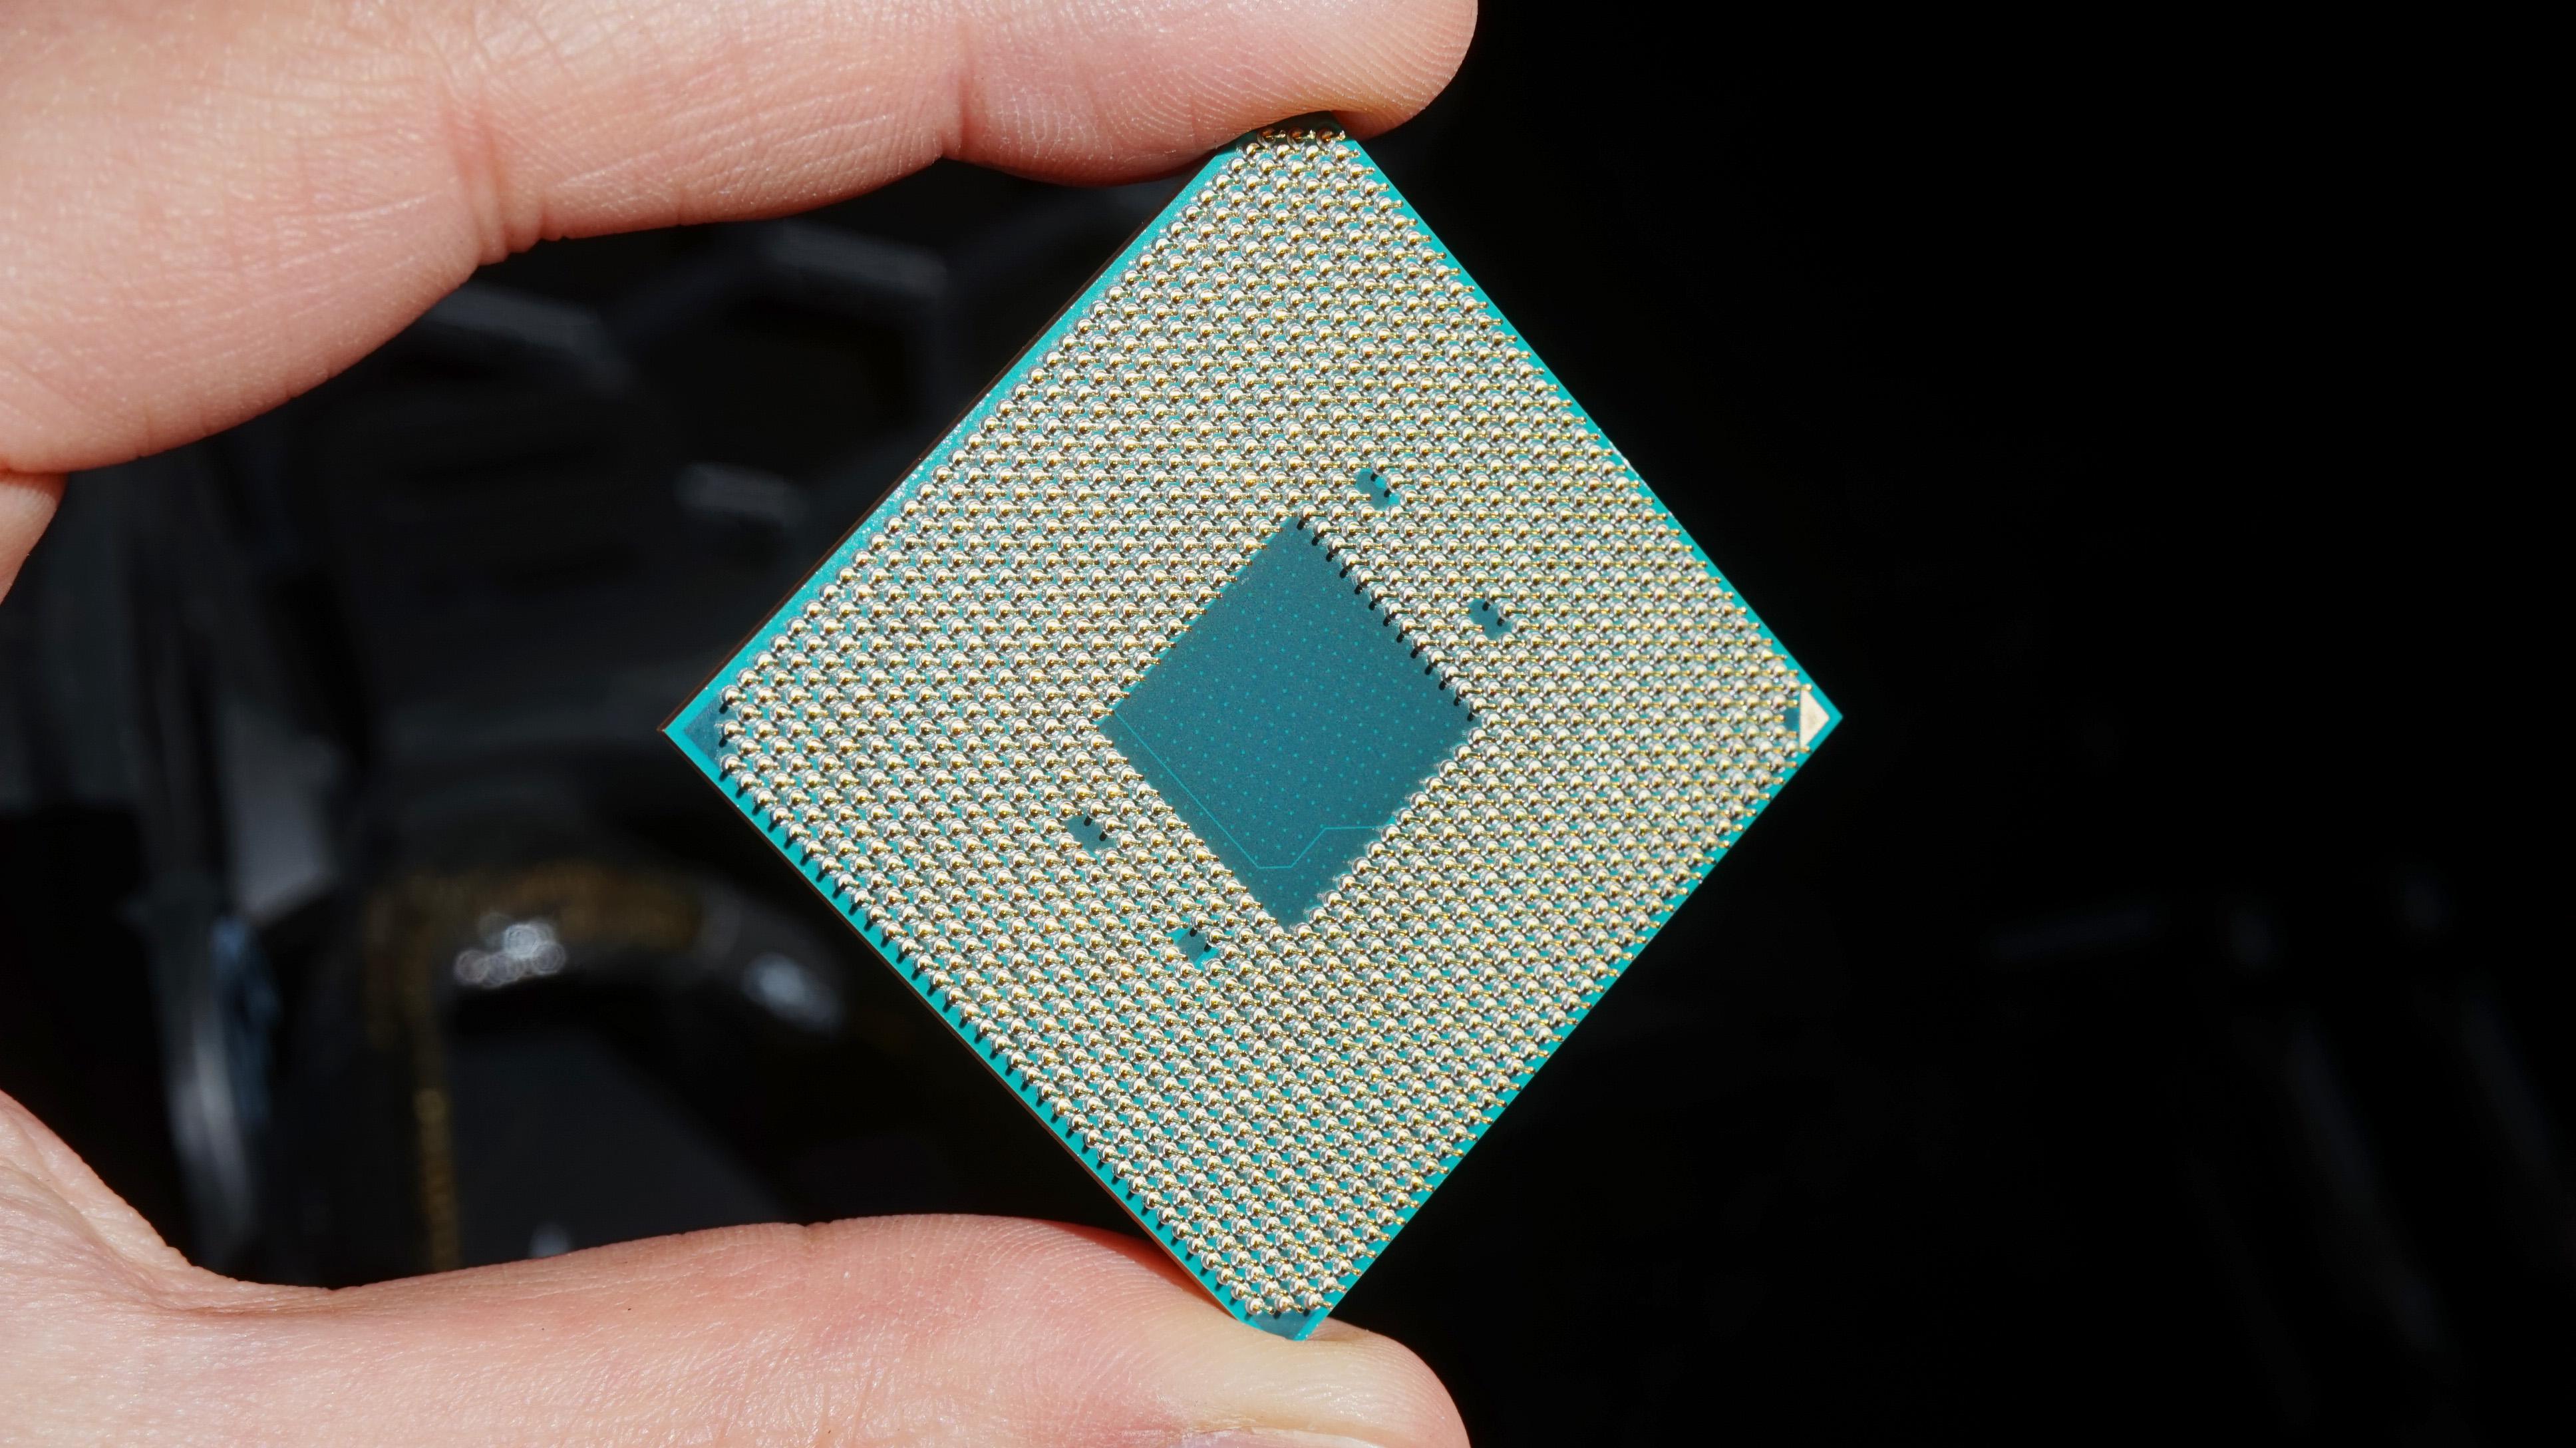 Amd Ryzen 5 2600 2600x Review The Intel Core I5 Killers Rock Paper Shotgun